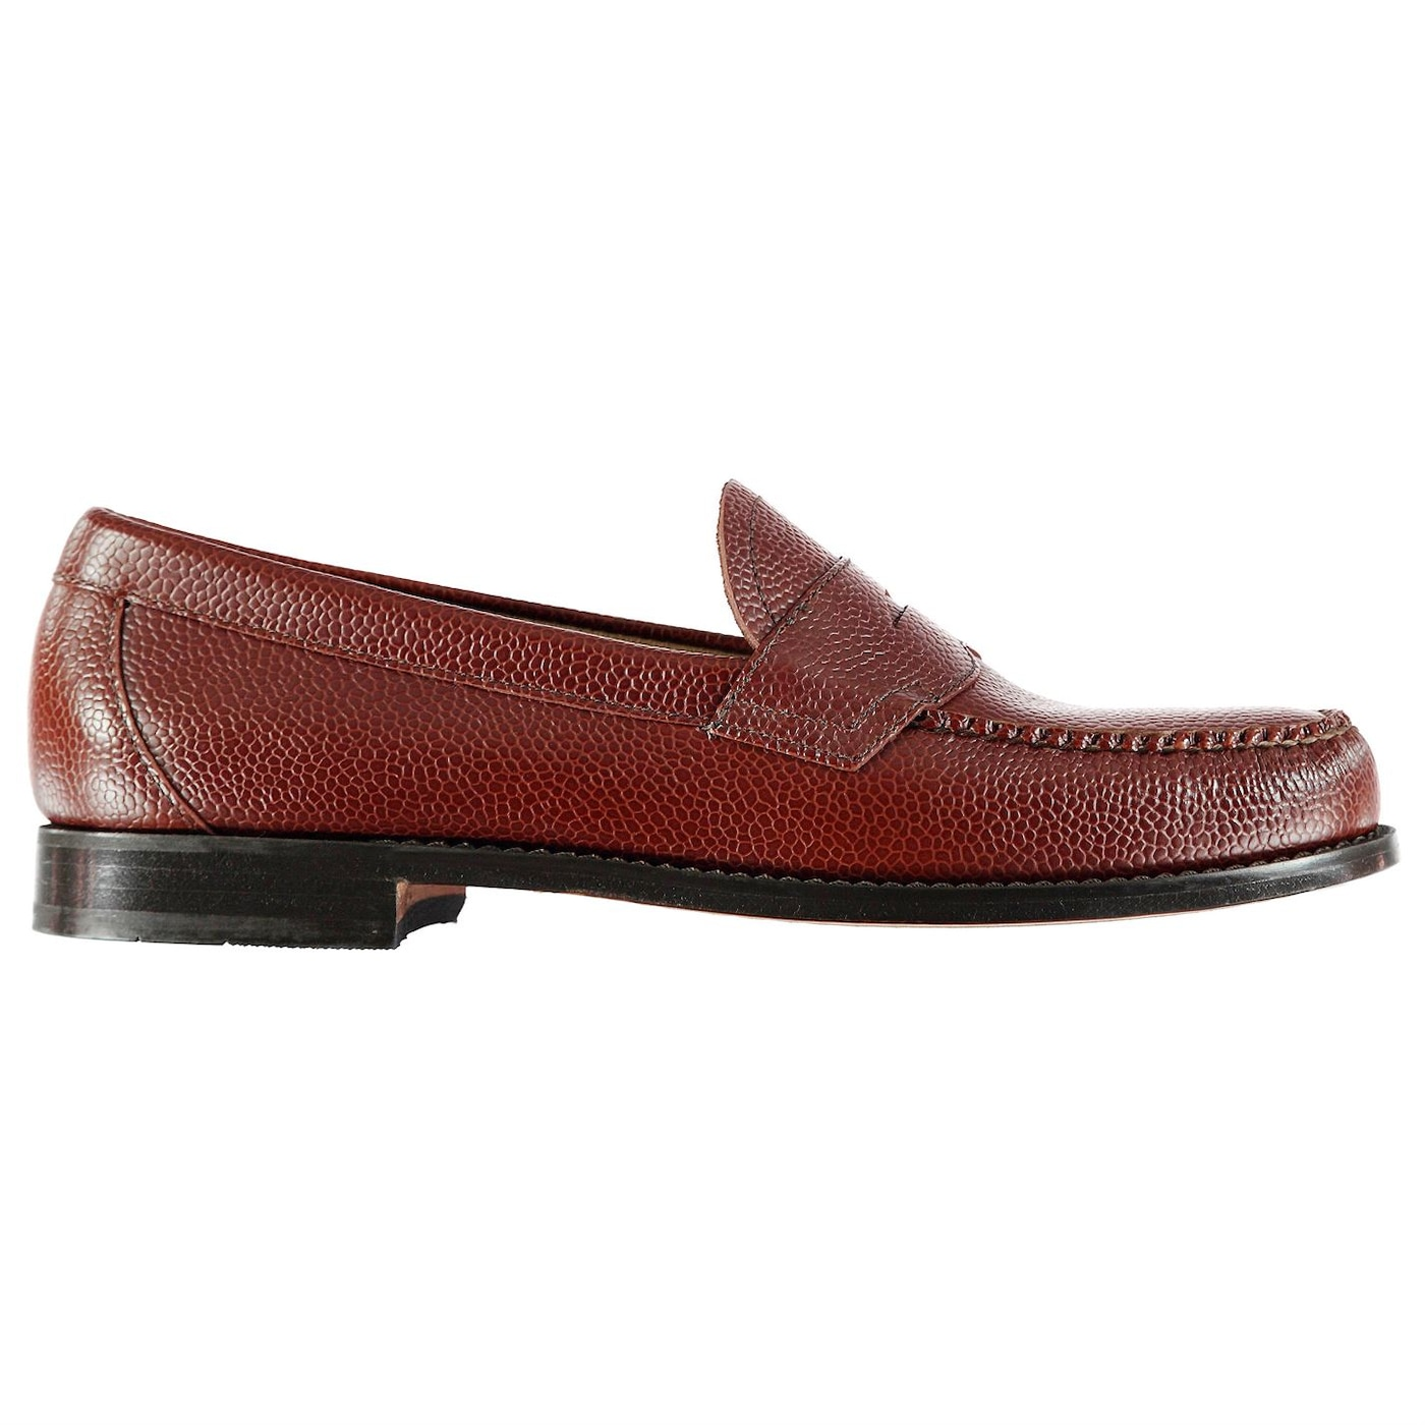 Bass Weejuns Logan Grain Shoes